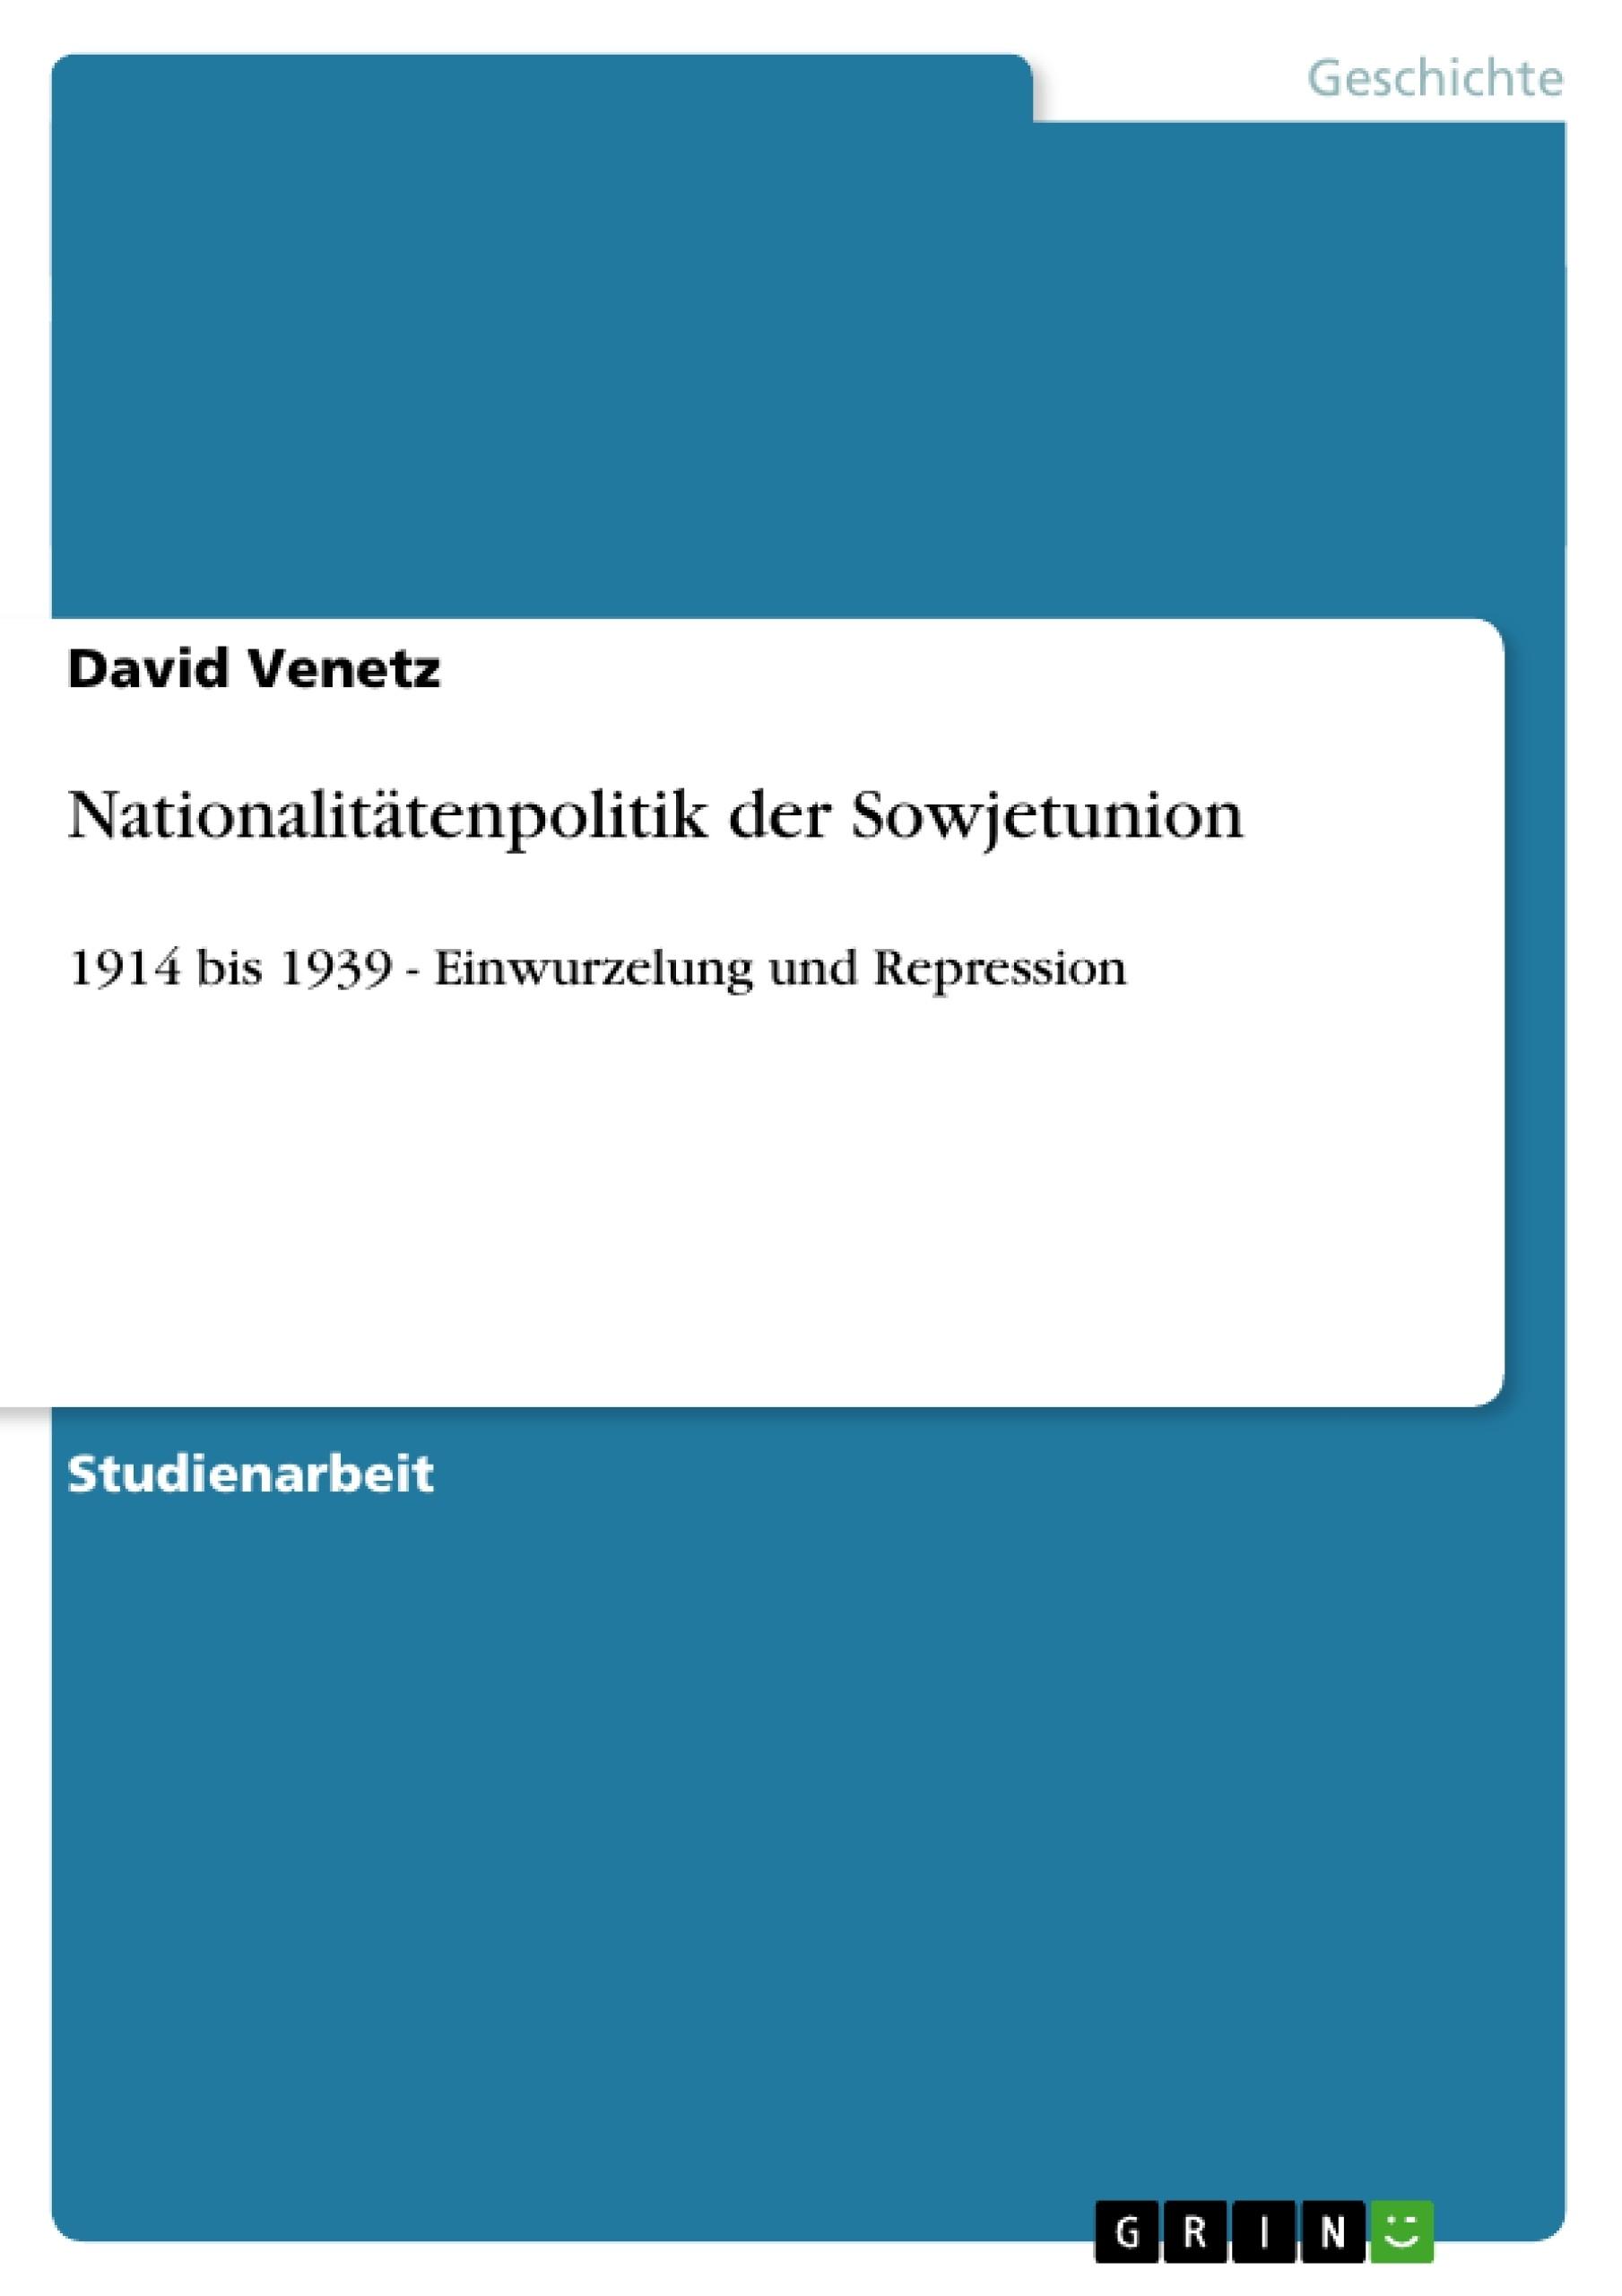 Titel: Nationalitätenpolitik der Sowjetunion